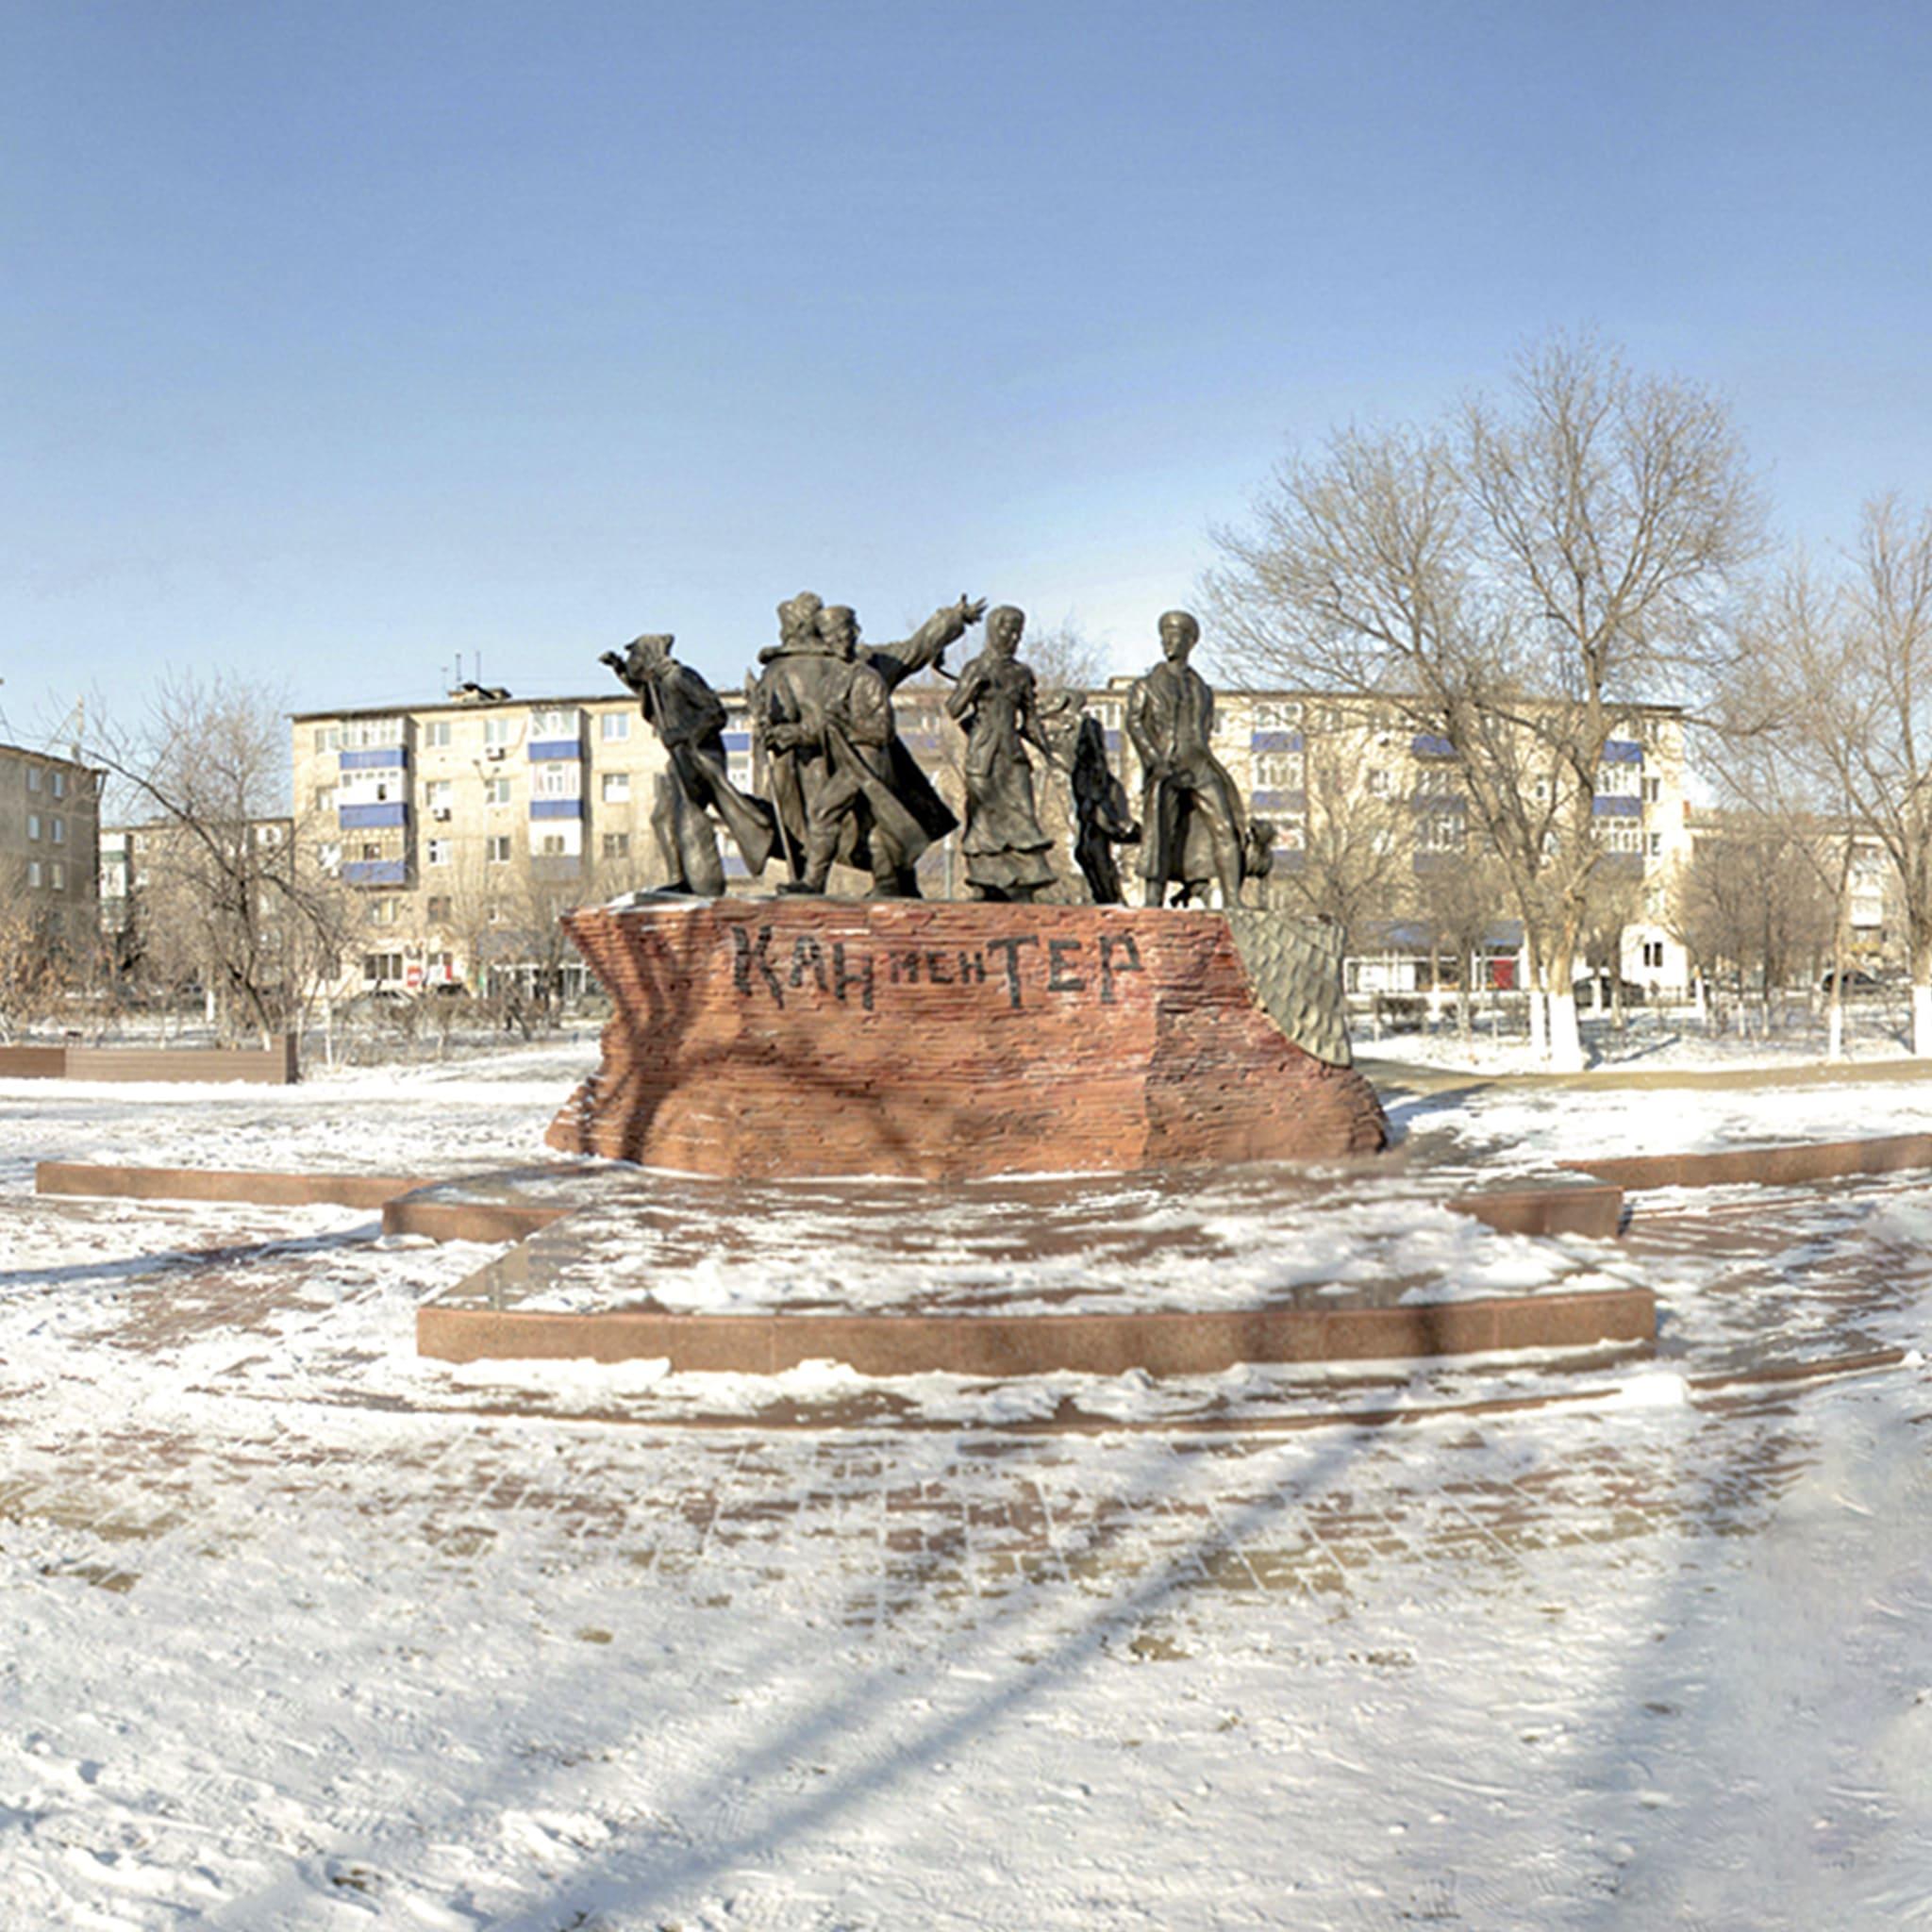 Памятник-обелиск героям романа «Қан мен тер»